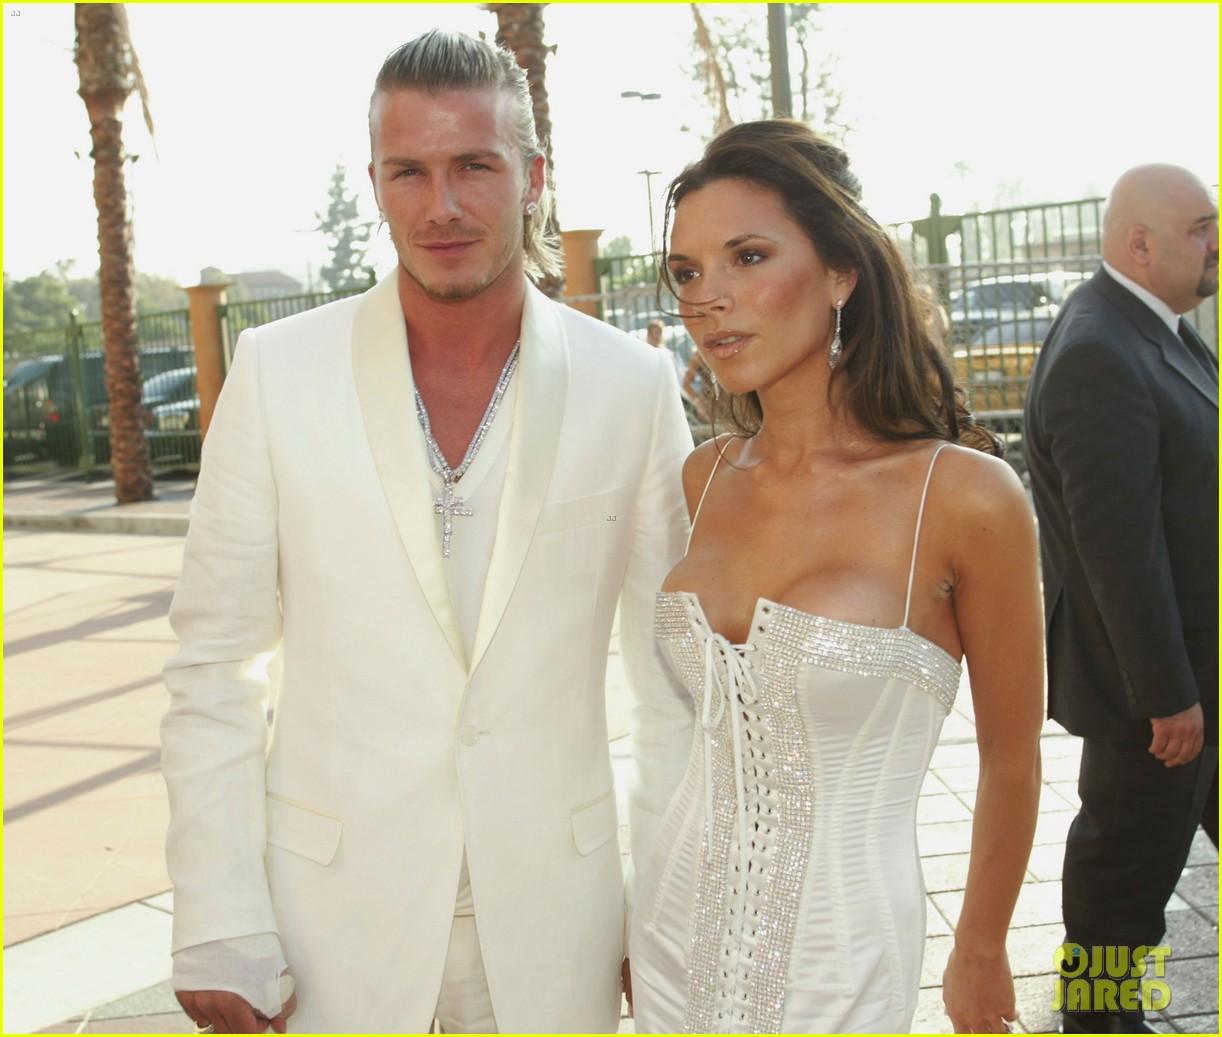 David & Victoria Beckham Share Sweet Throwback Photos on